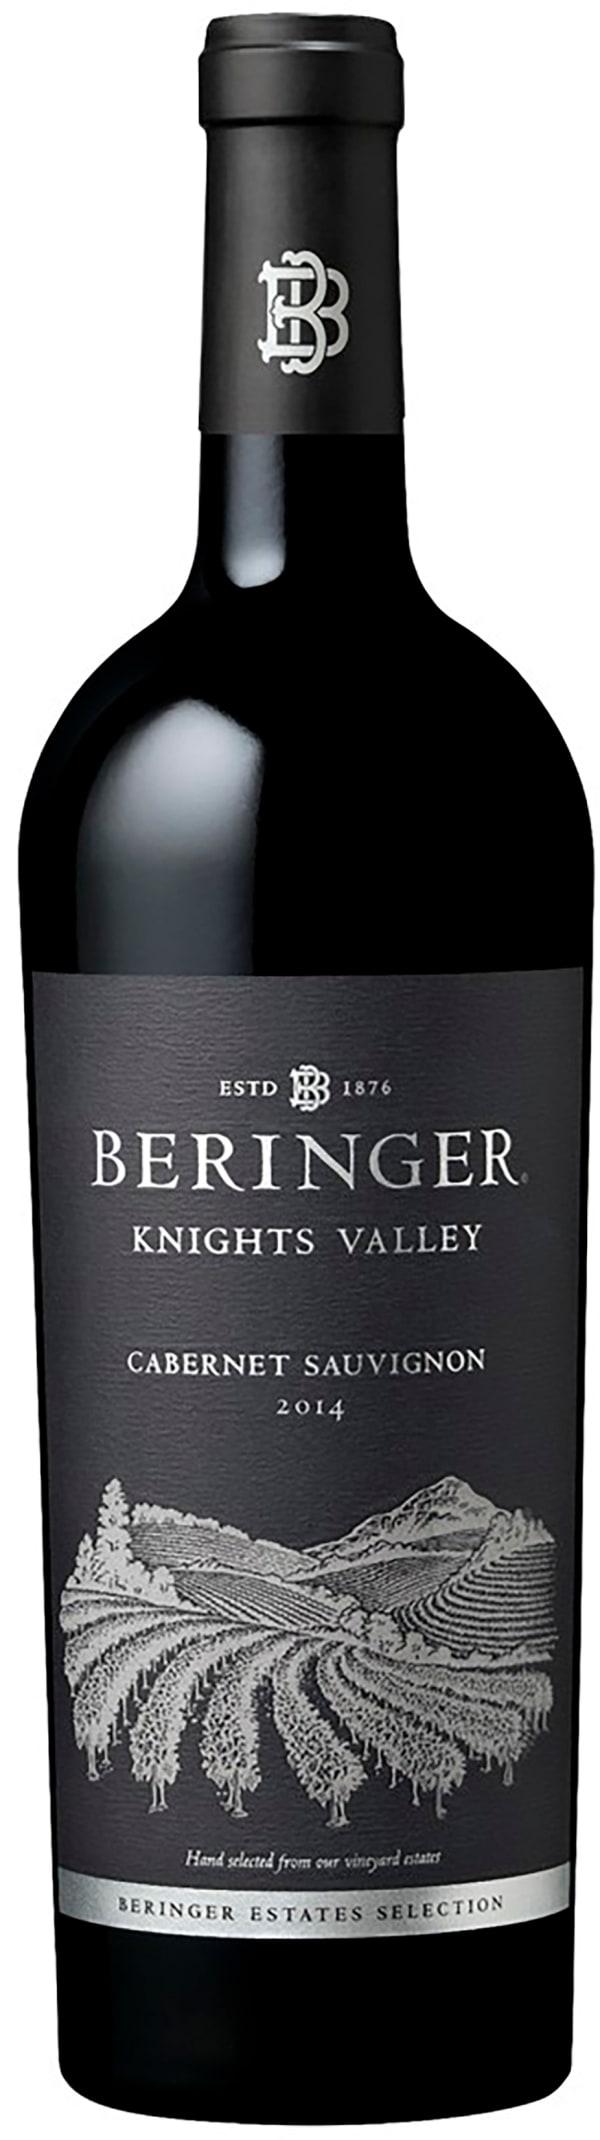 Beringer Knights Valley Cabernet Sauvignon 2014